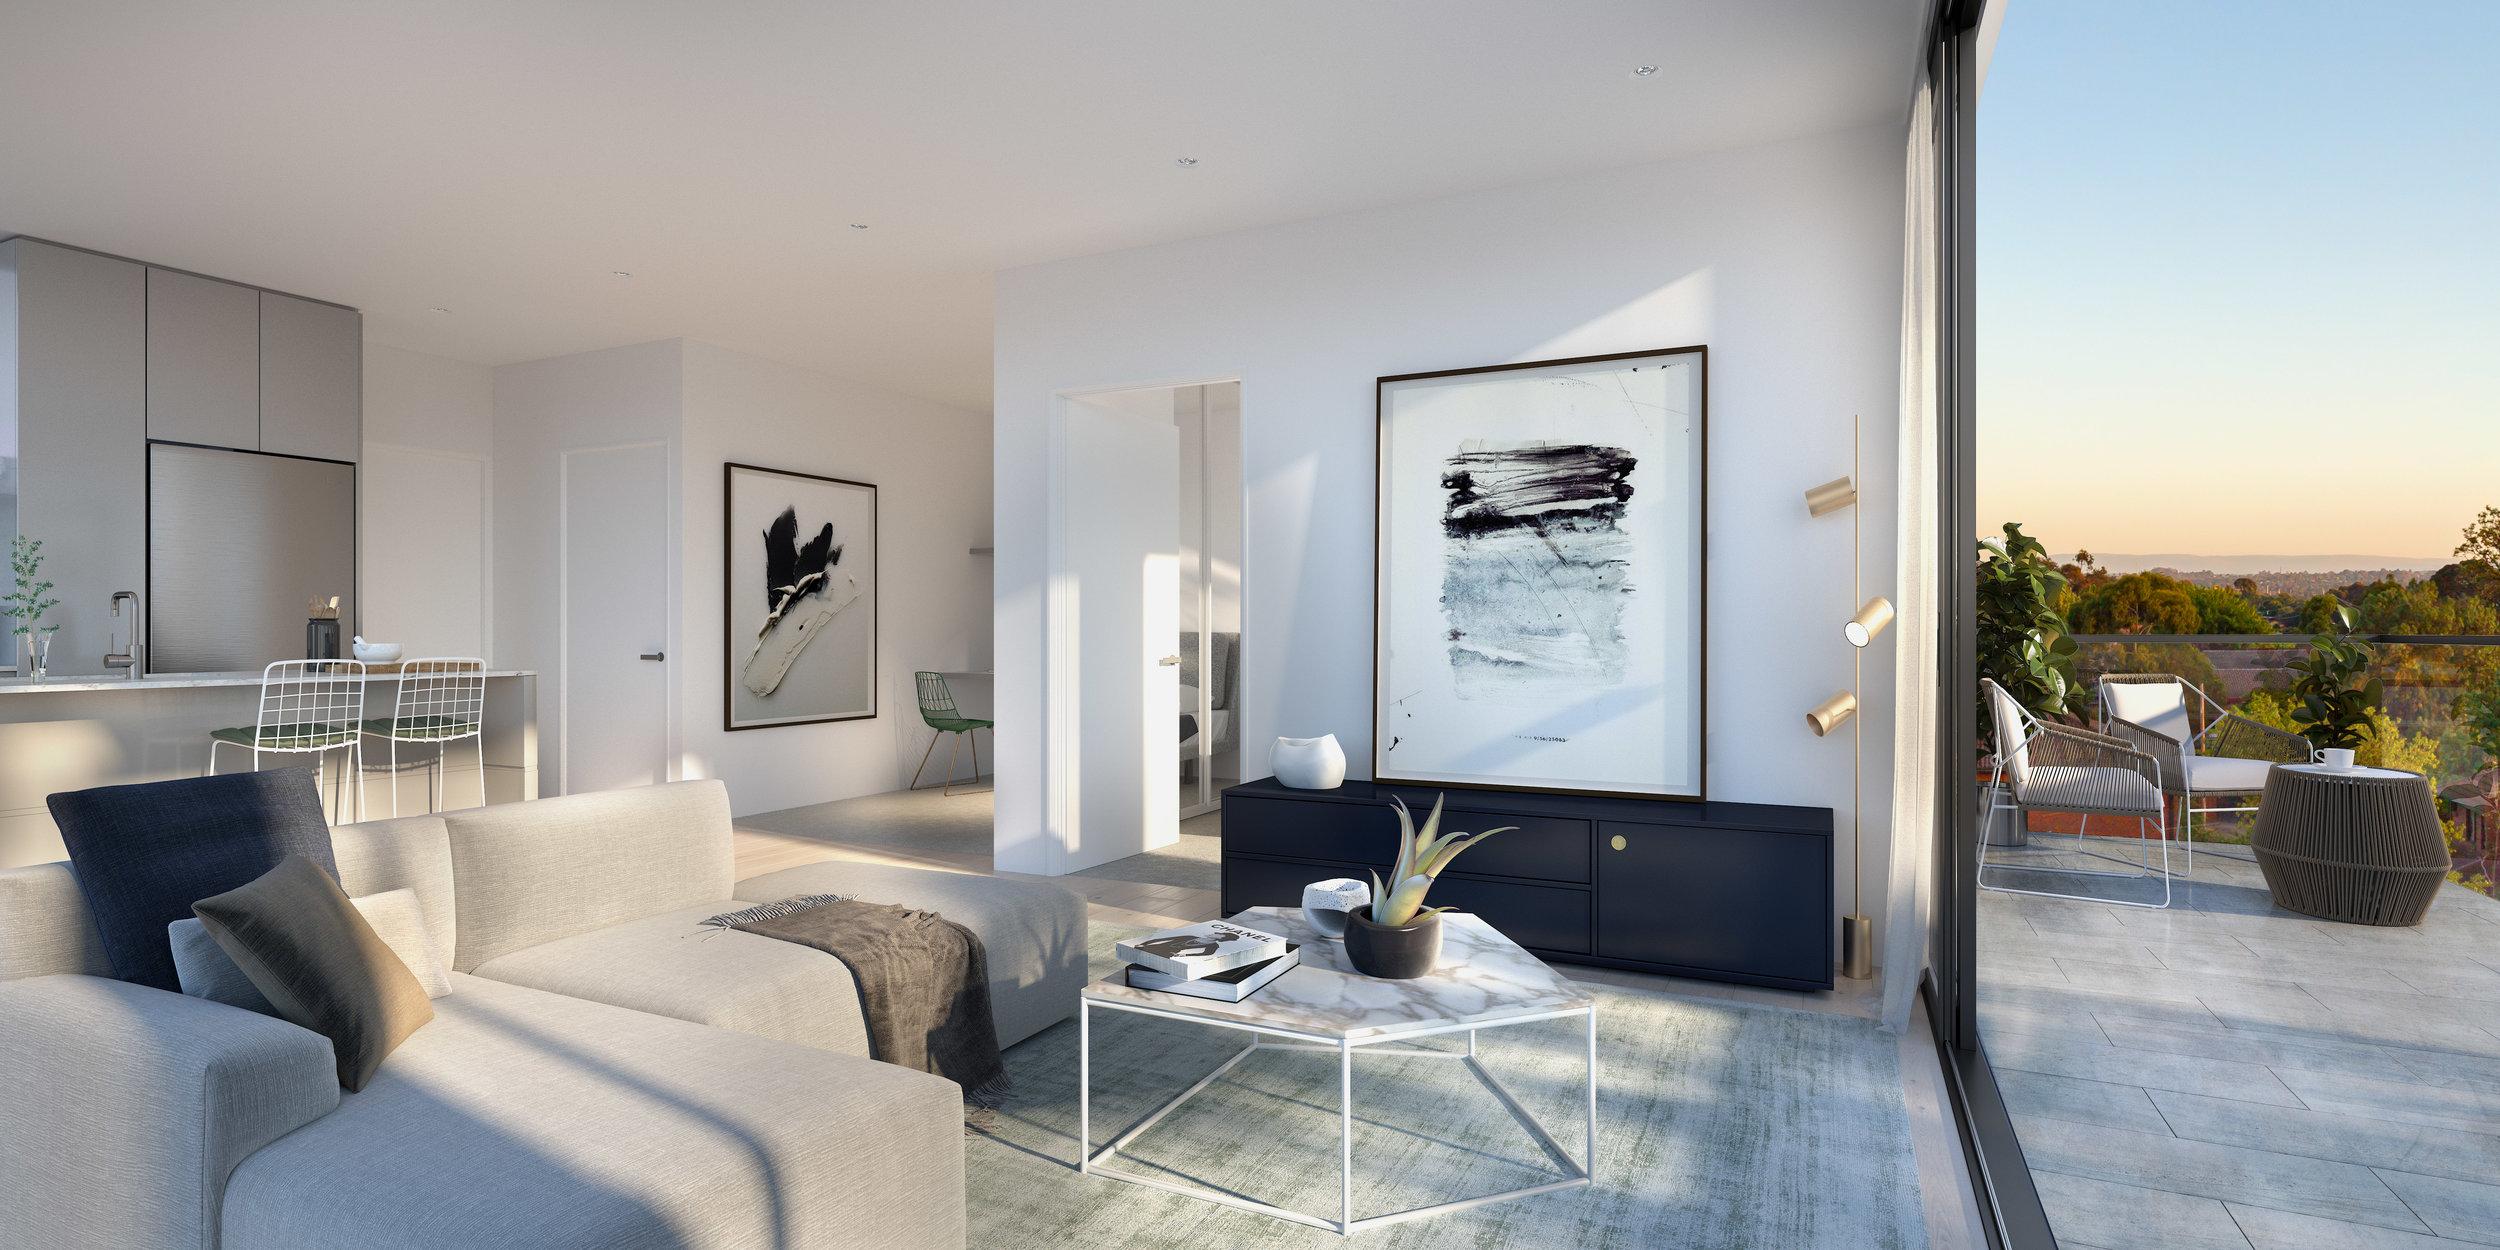 M&P_Apartment_1 Bed Living.jpg